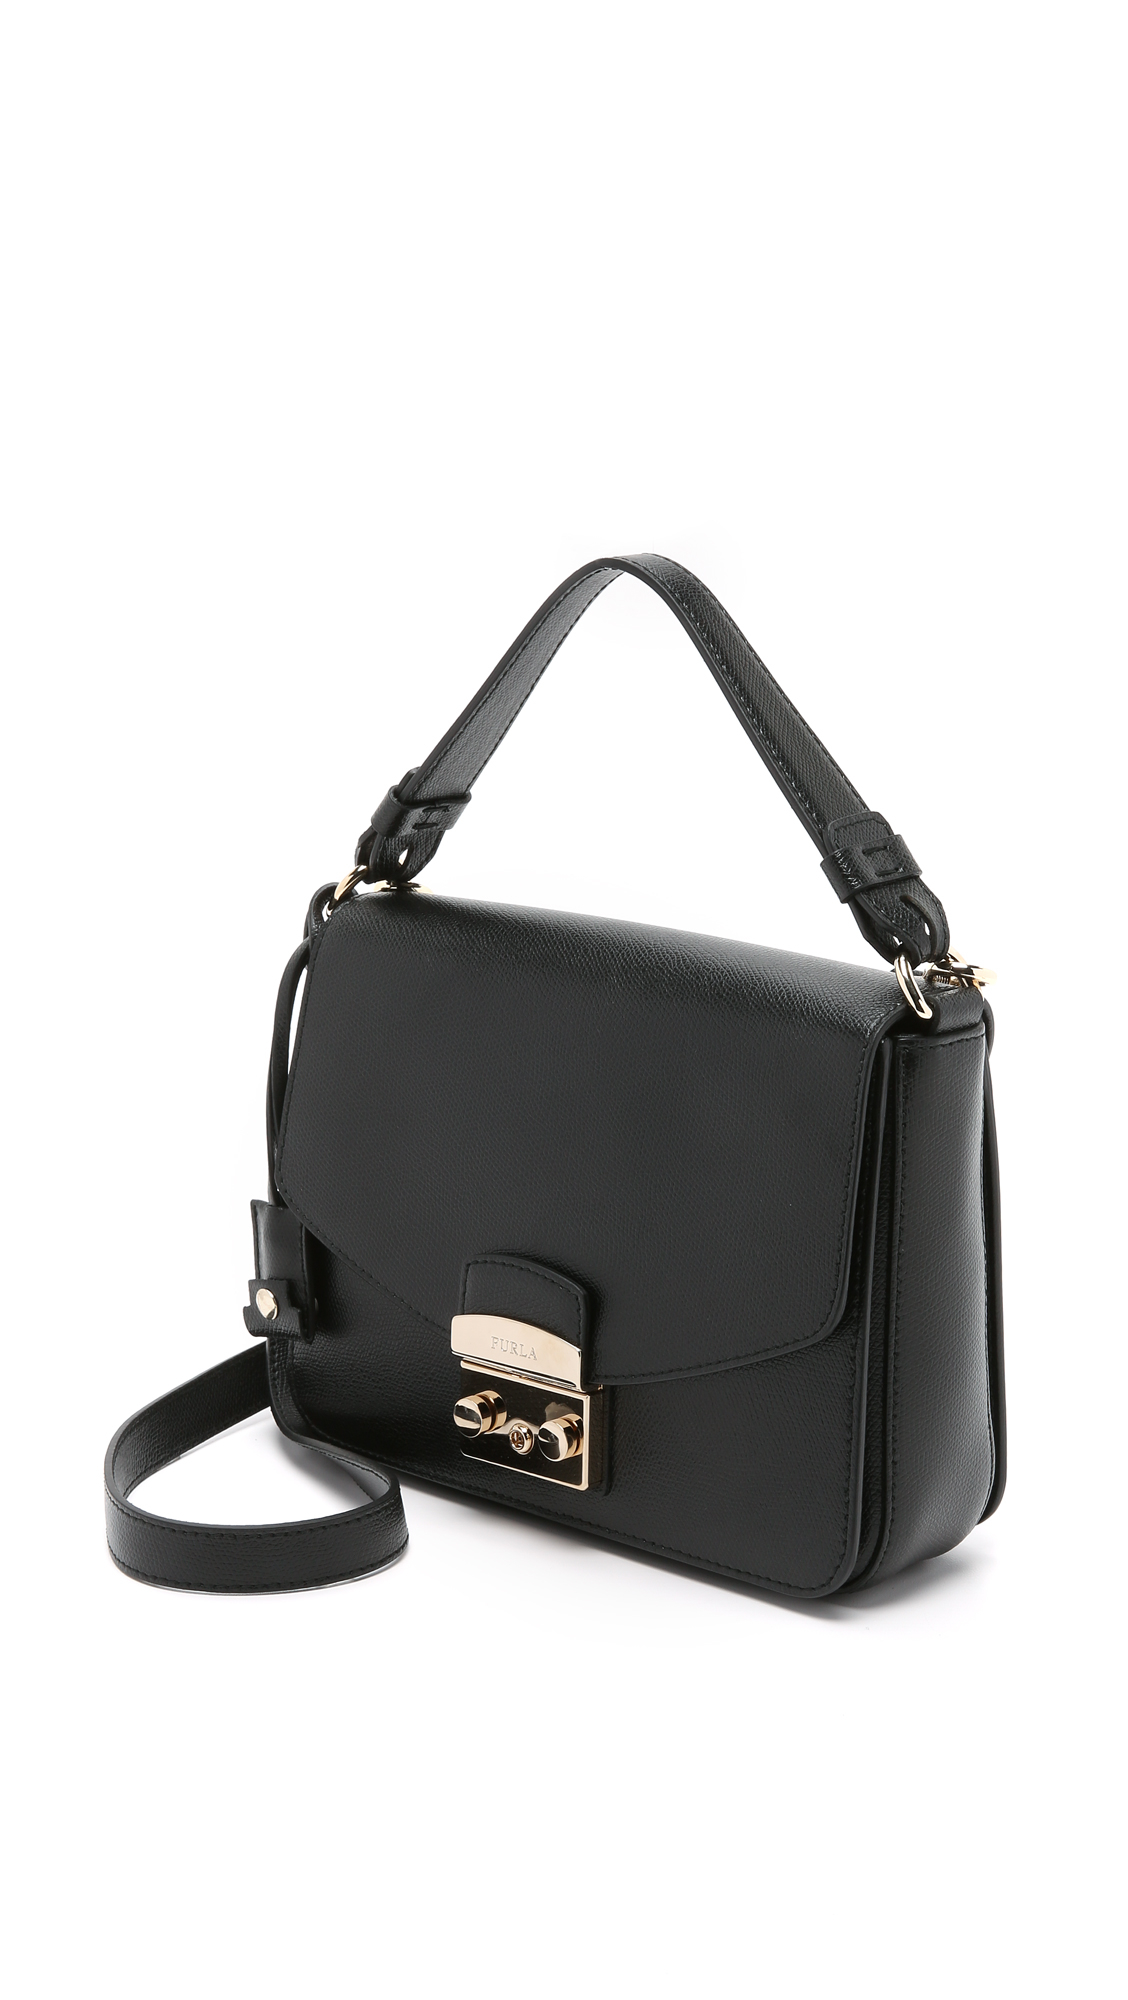 Lyst - Furla Metropolis Small Shoulder Bag in Black 677b4e20baa75